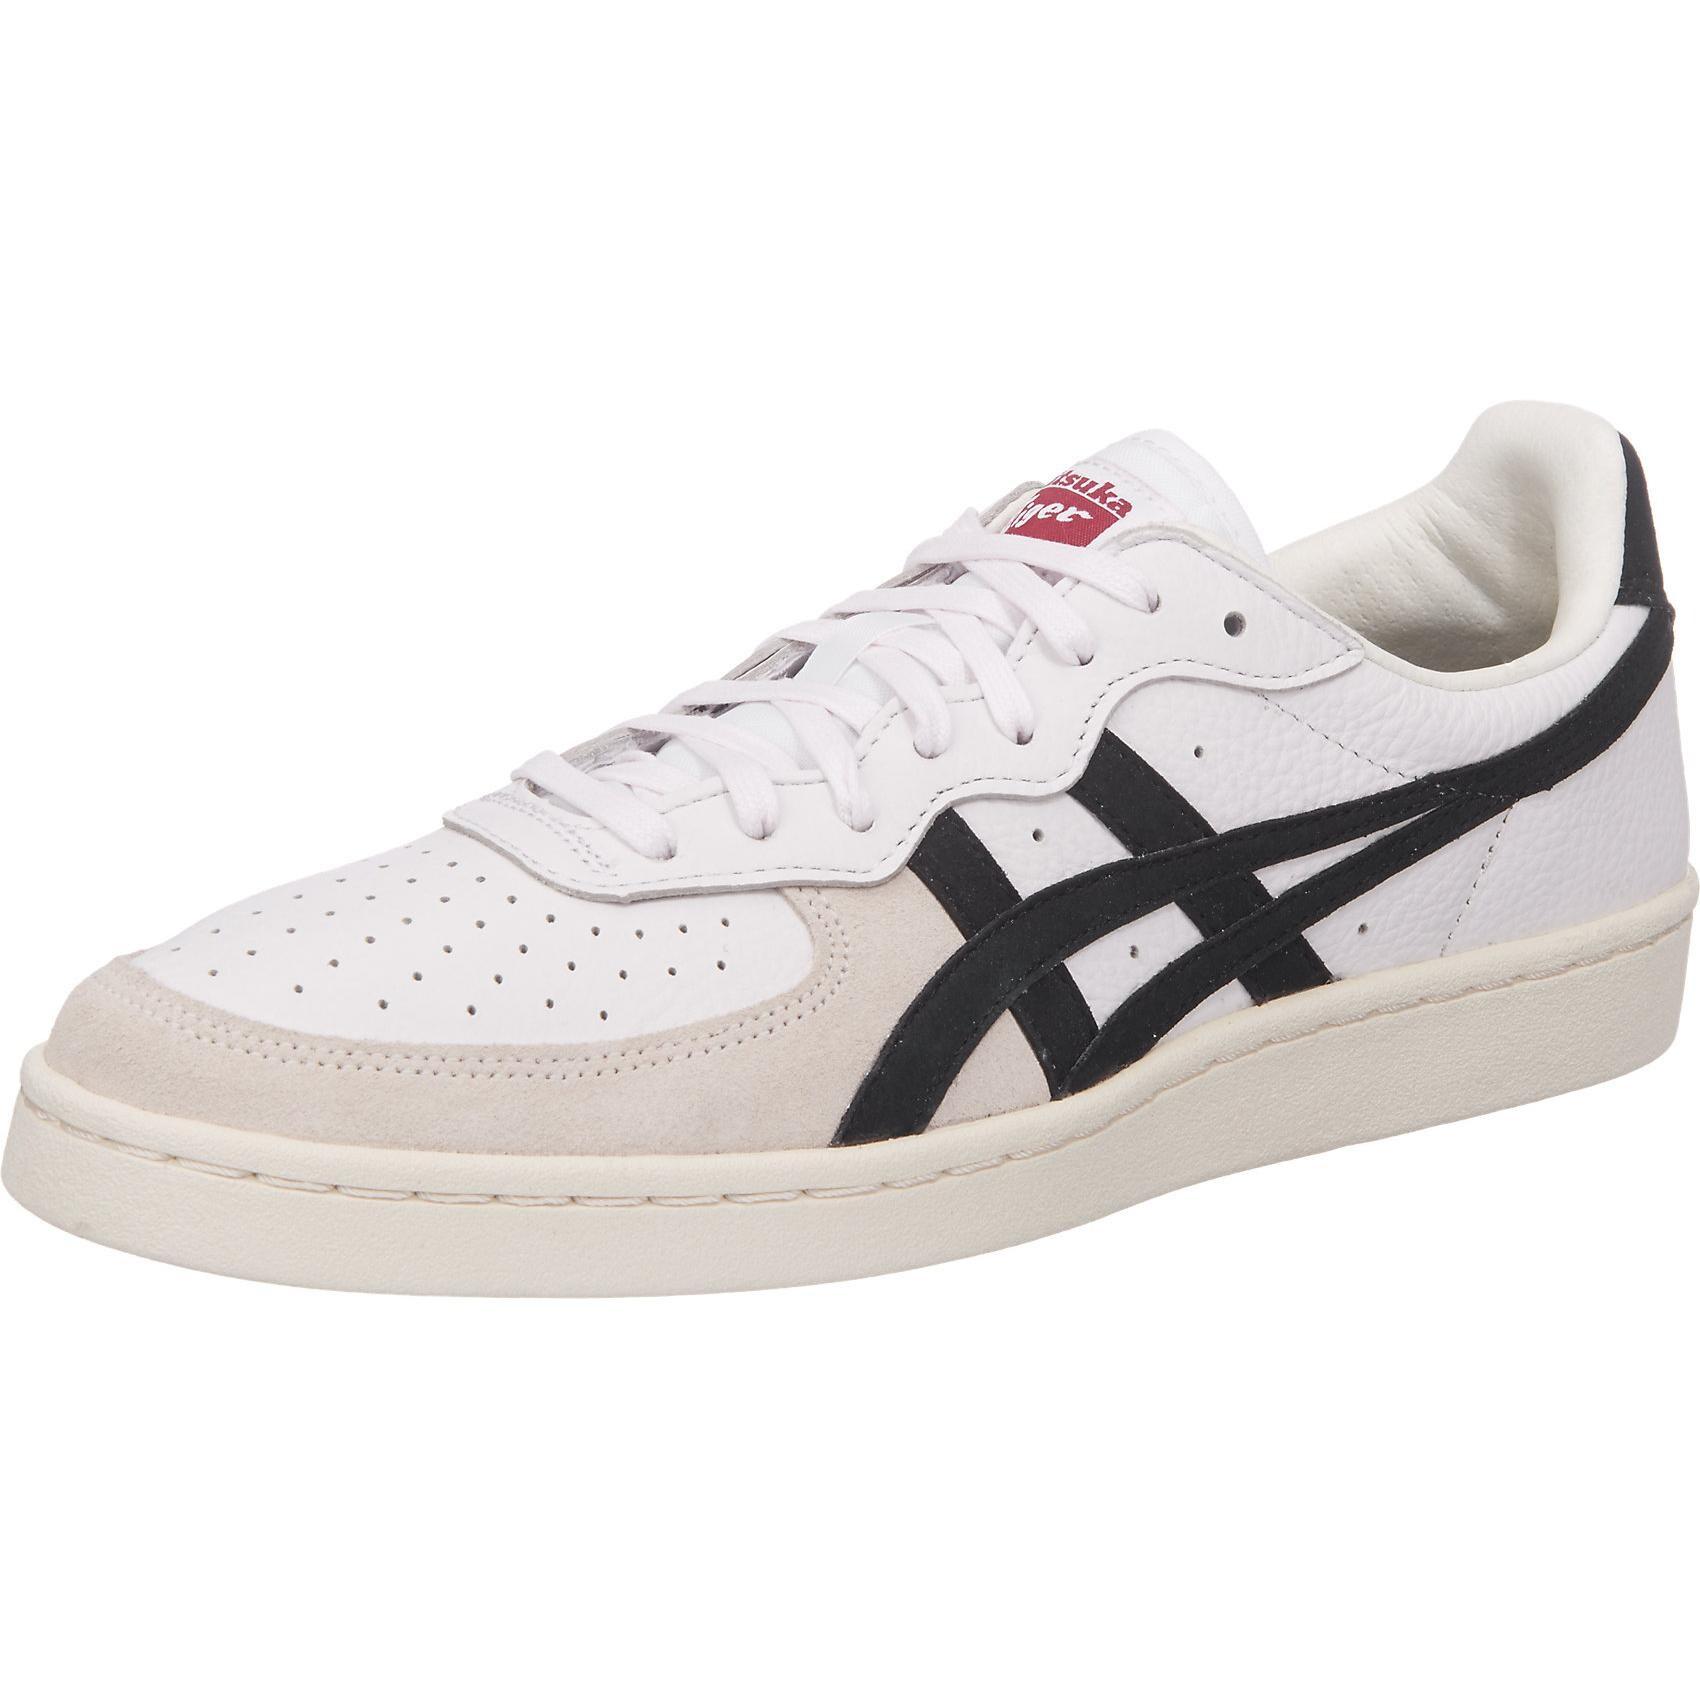 Damen Schuhe online bestellen » REWE